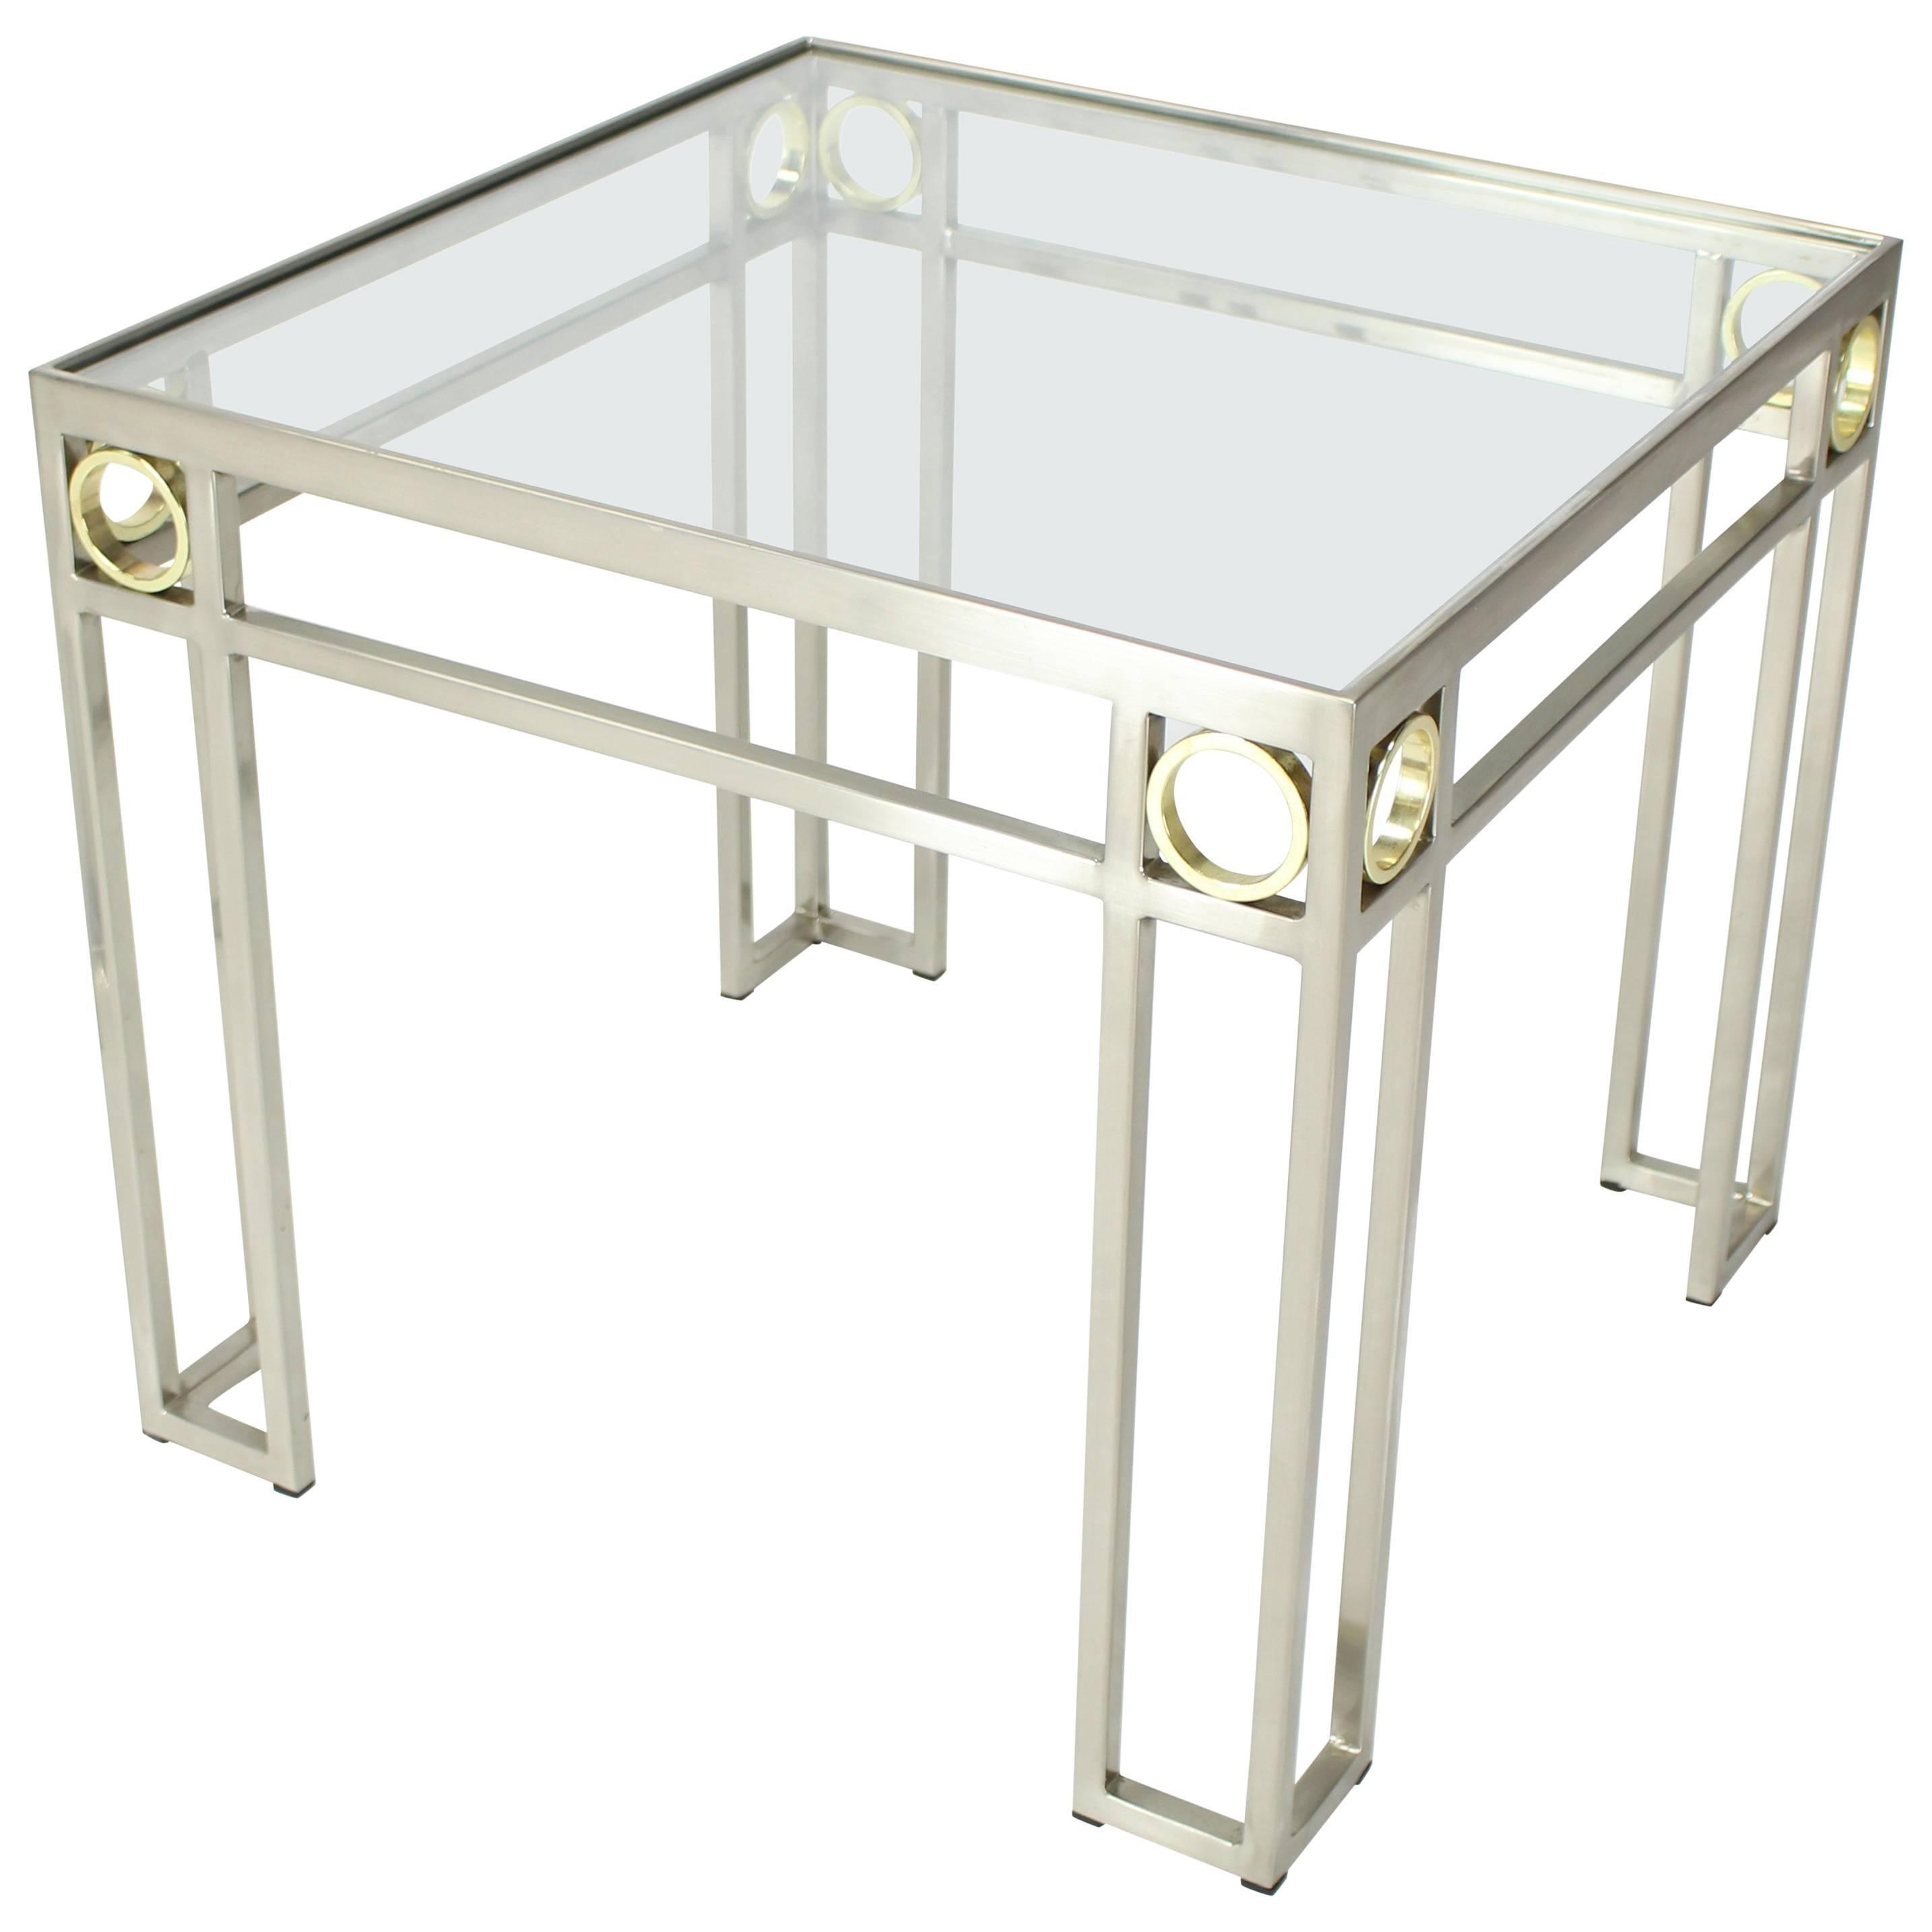 Square Brass Rings Chrome Frame Shape Base Glass Top Side Table 1